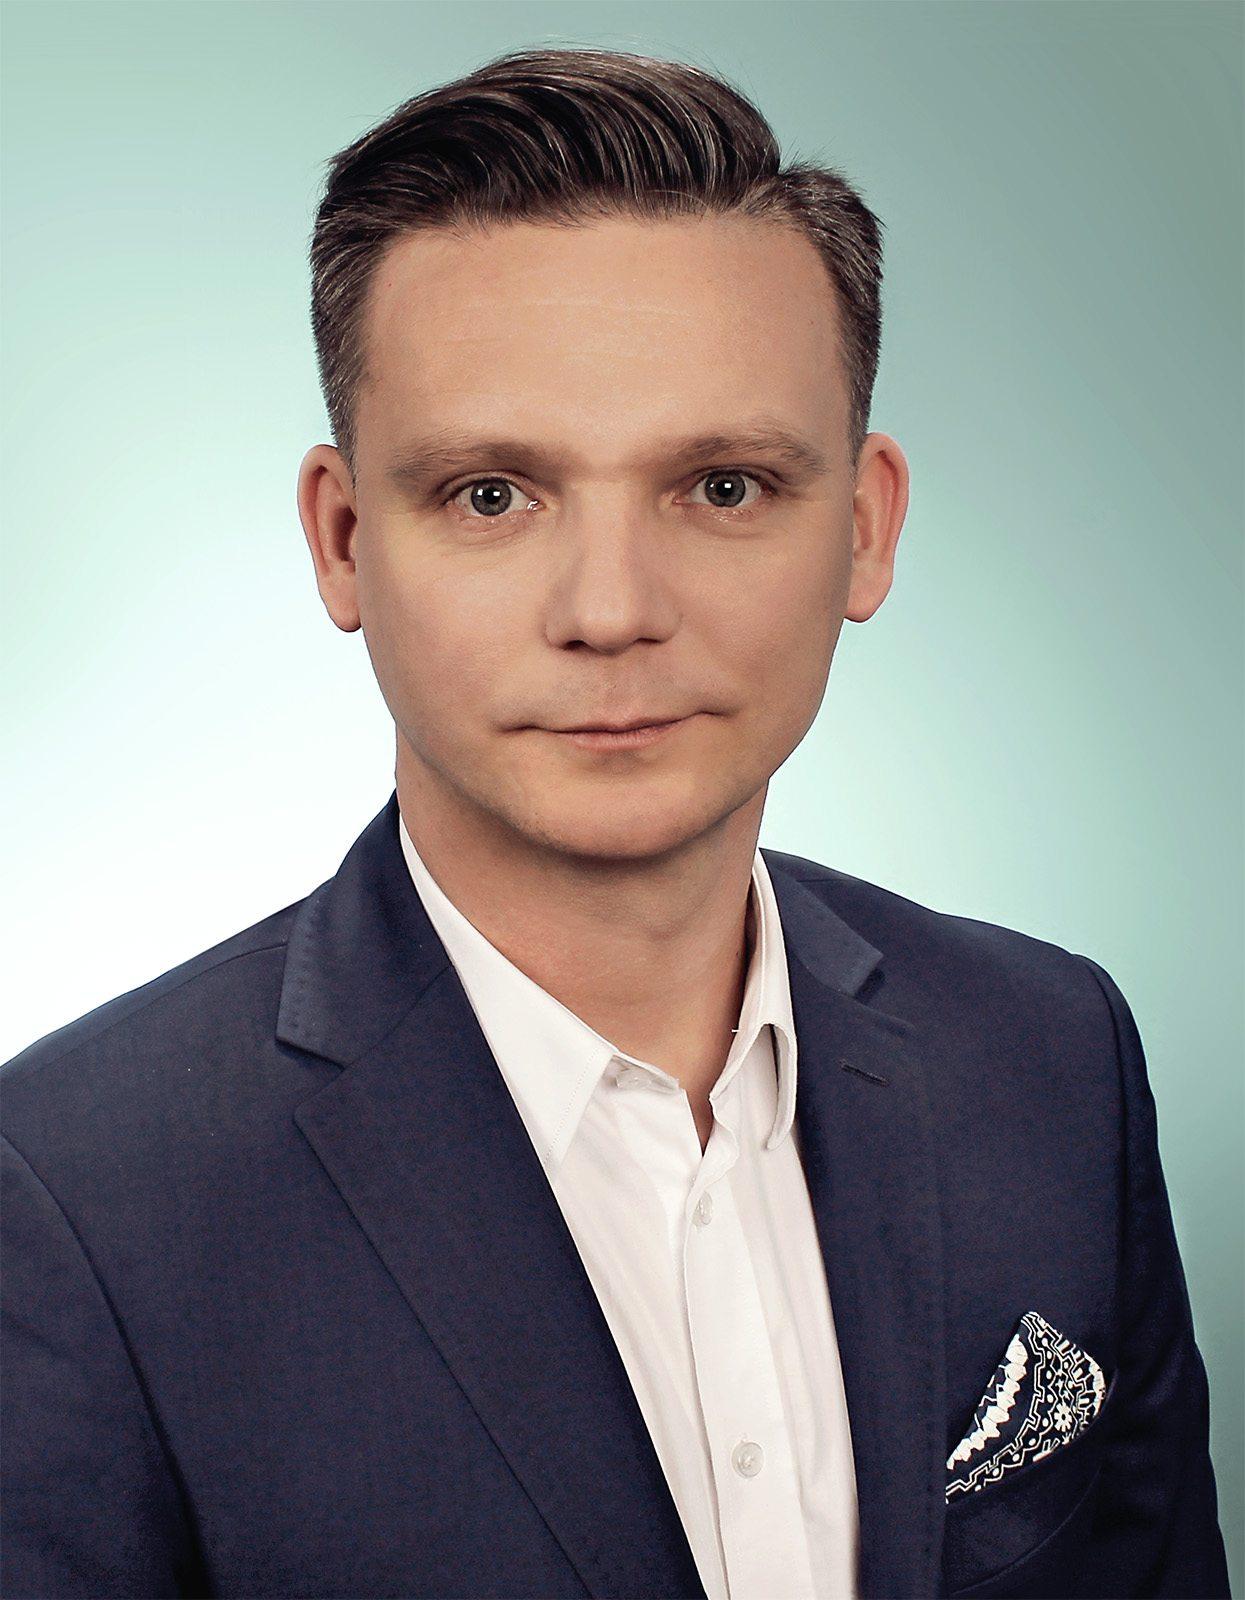 Tomasz Tybon